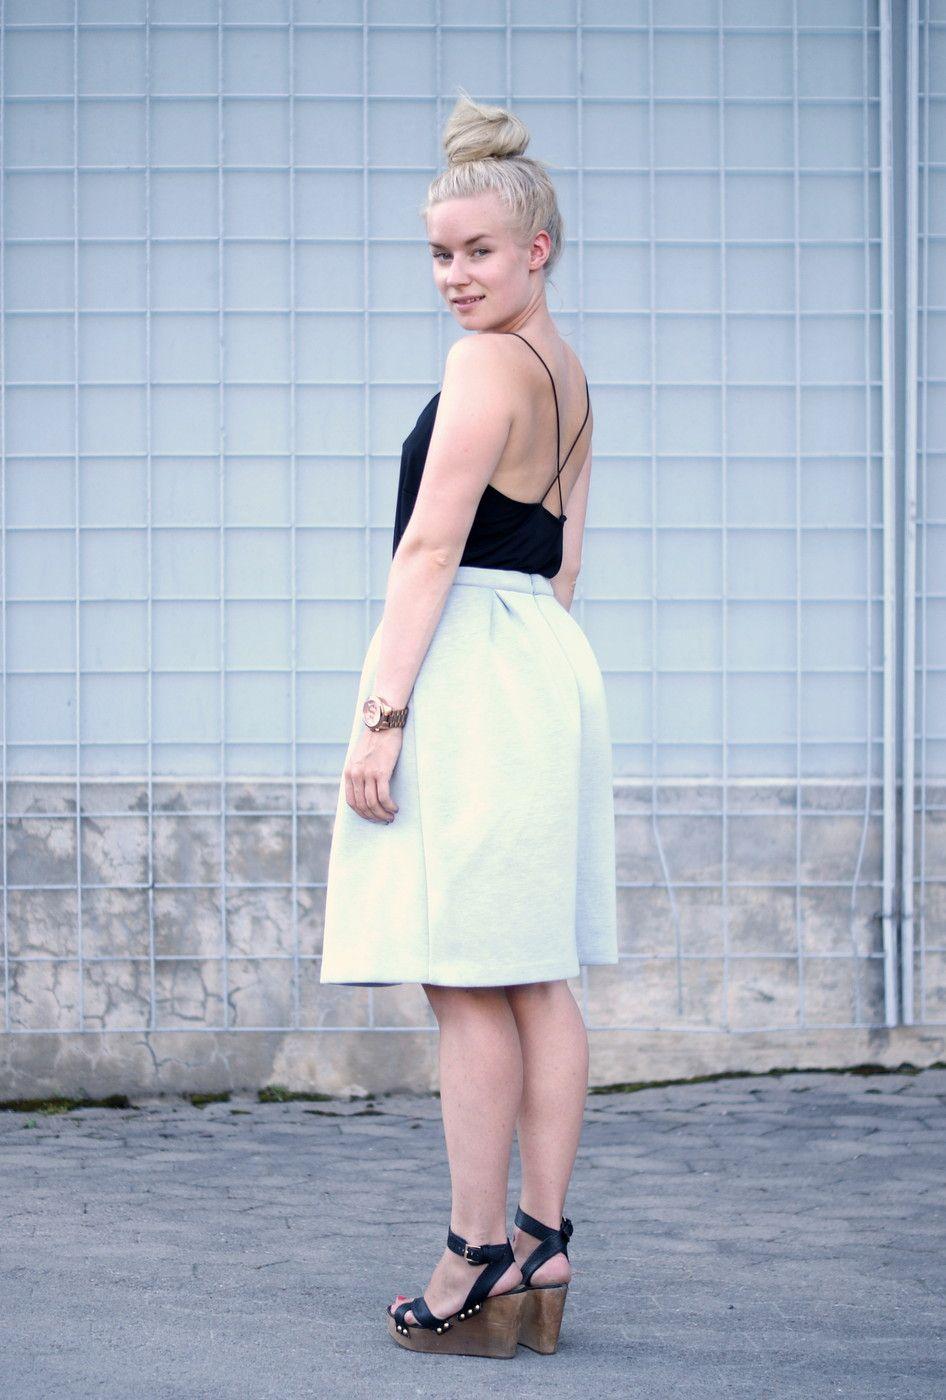 Girly dress / sandalets / bun